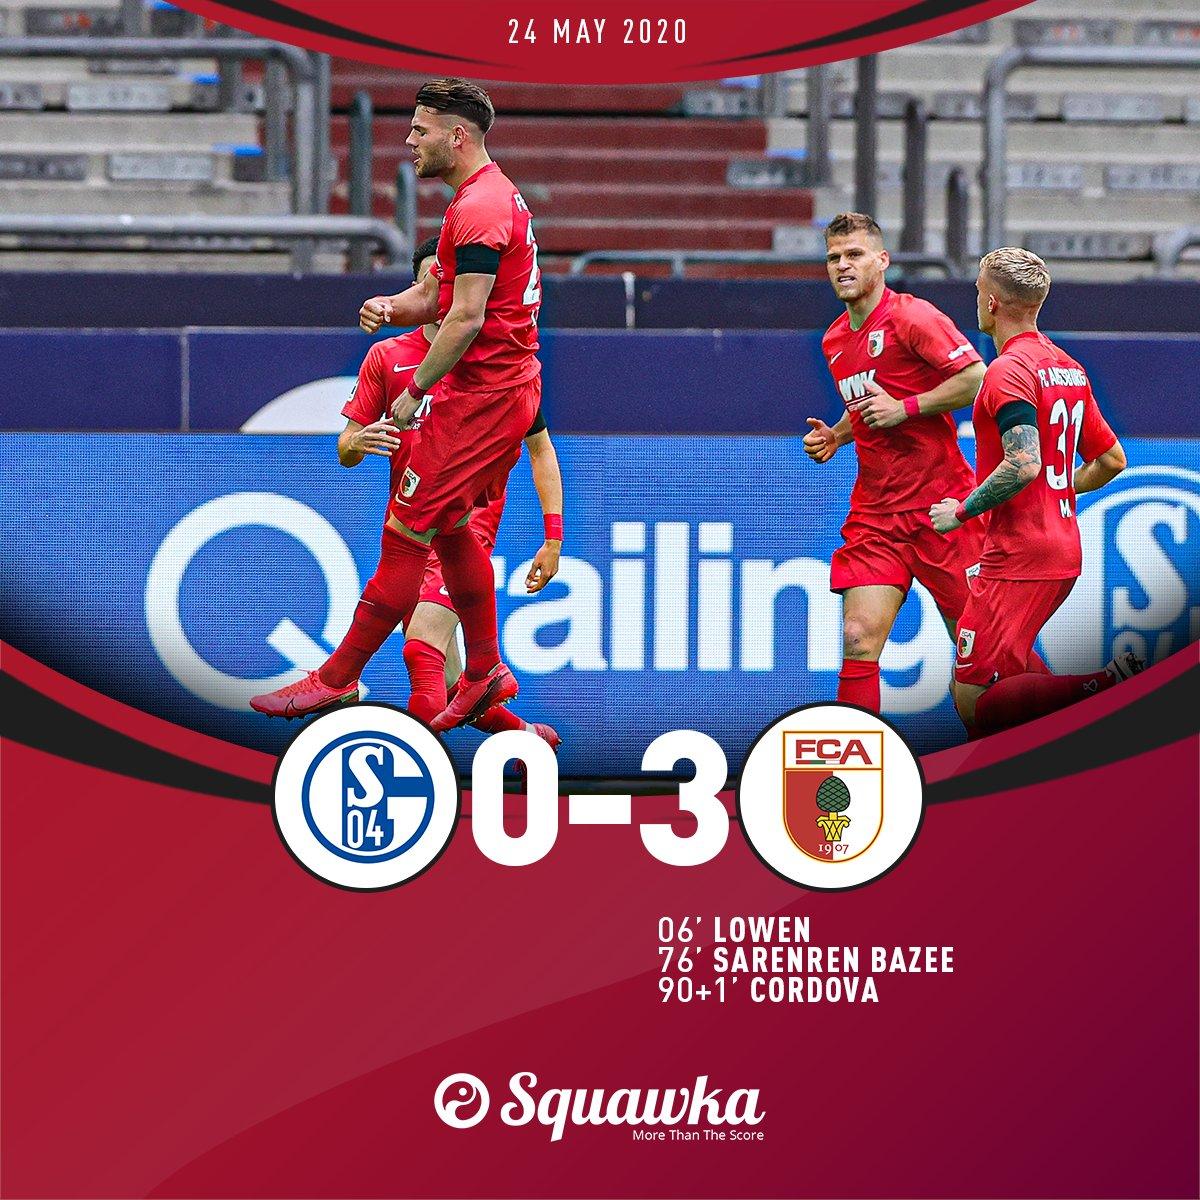 Schalke 0-3 Augsburg FT: ⚽️ Lowen ⚽️ Sarenren Bazee ⚽️ Cordova An emphatic victory for the visitors.